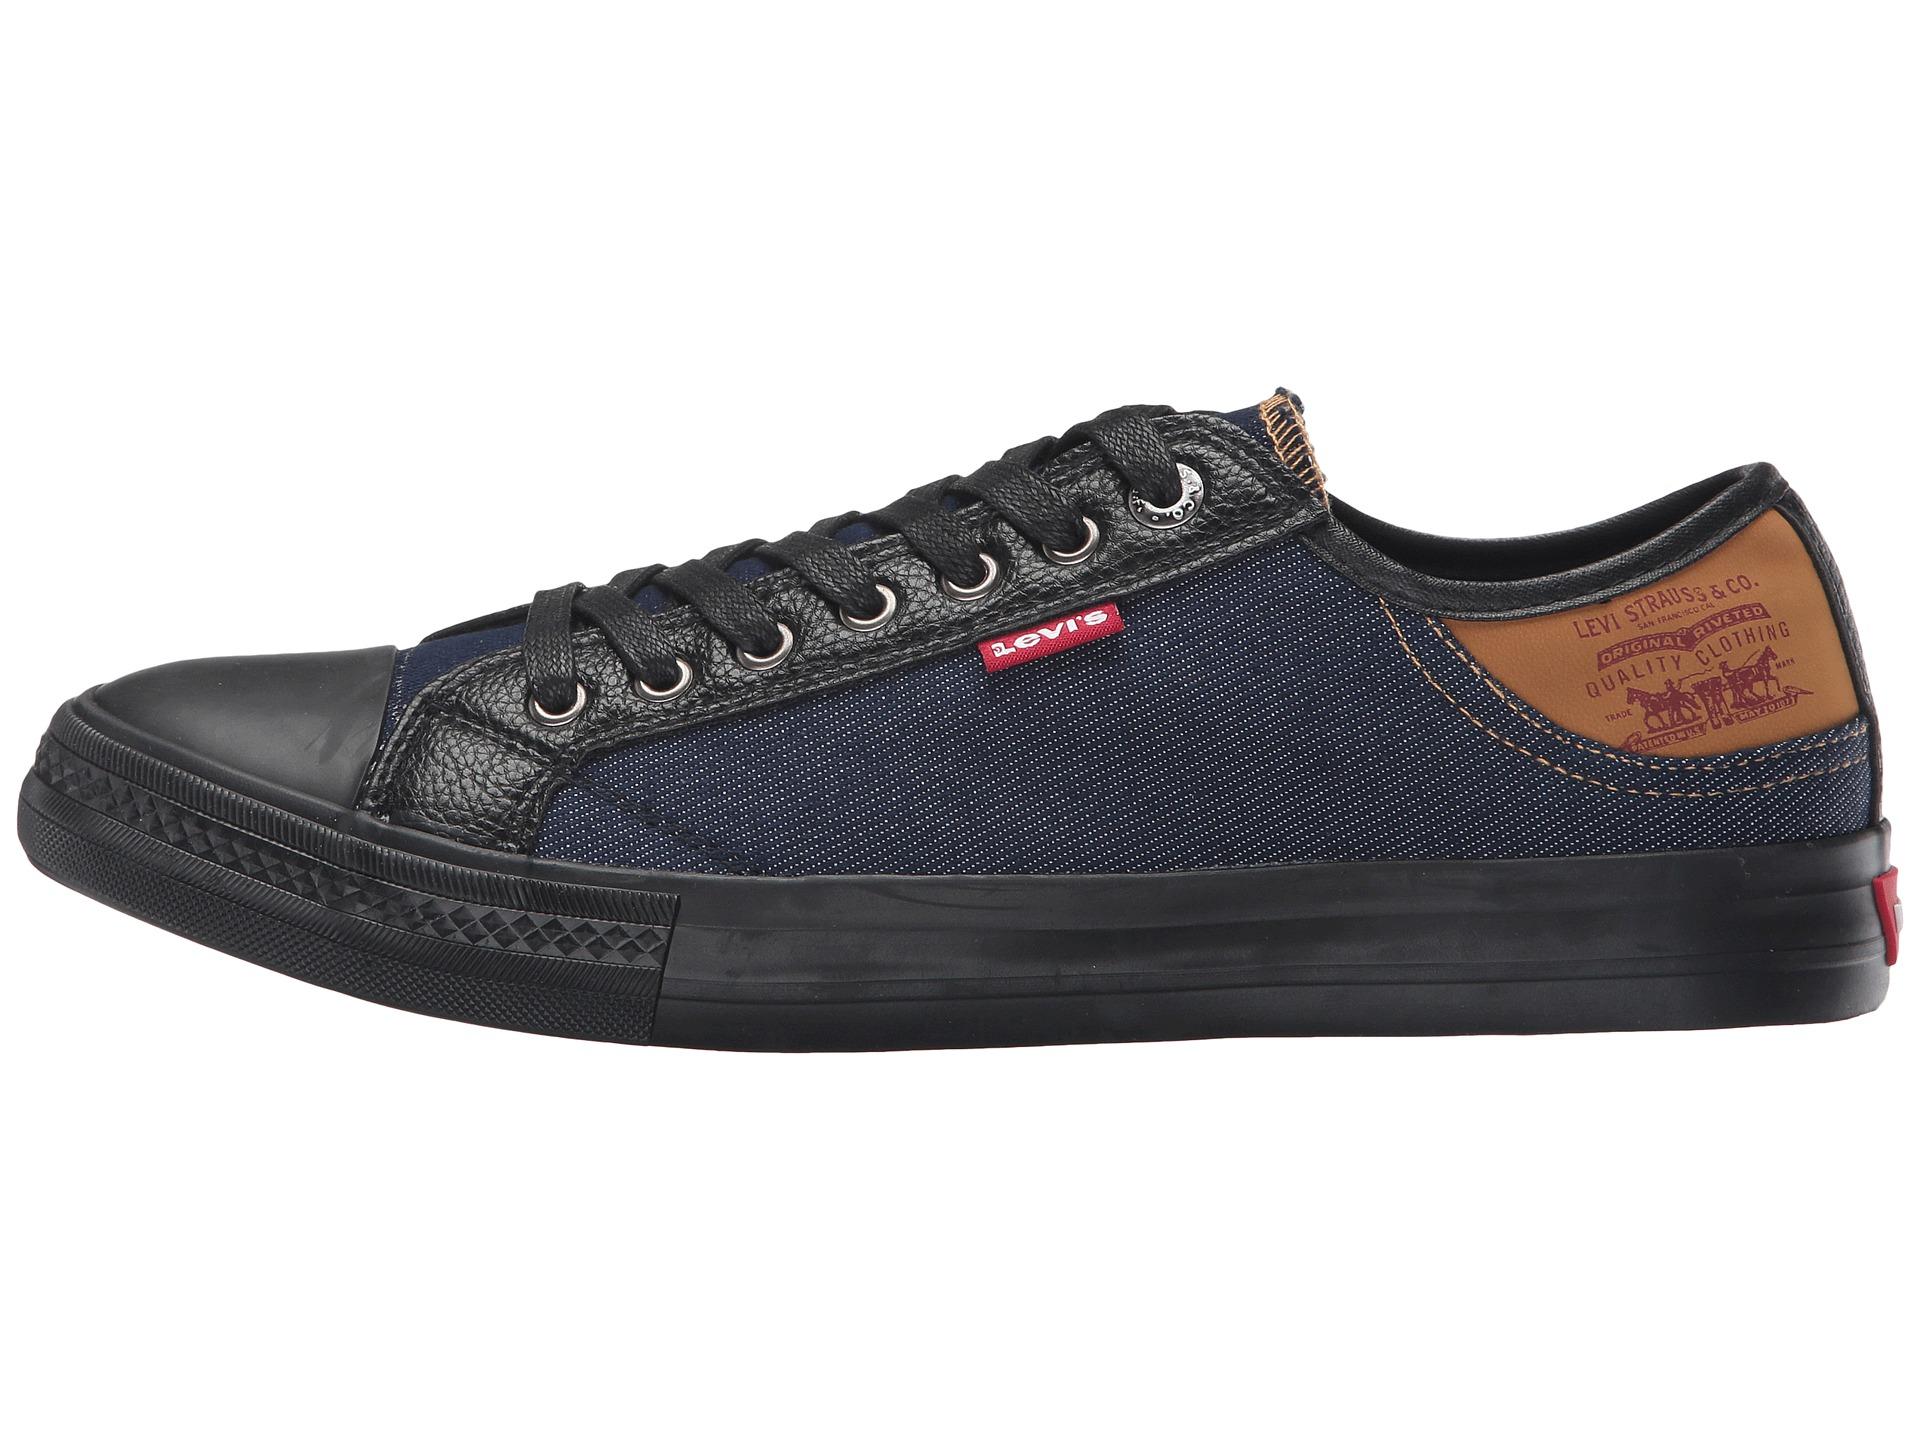 Levi S Shoes Size Guide